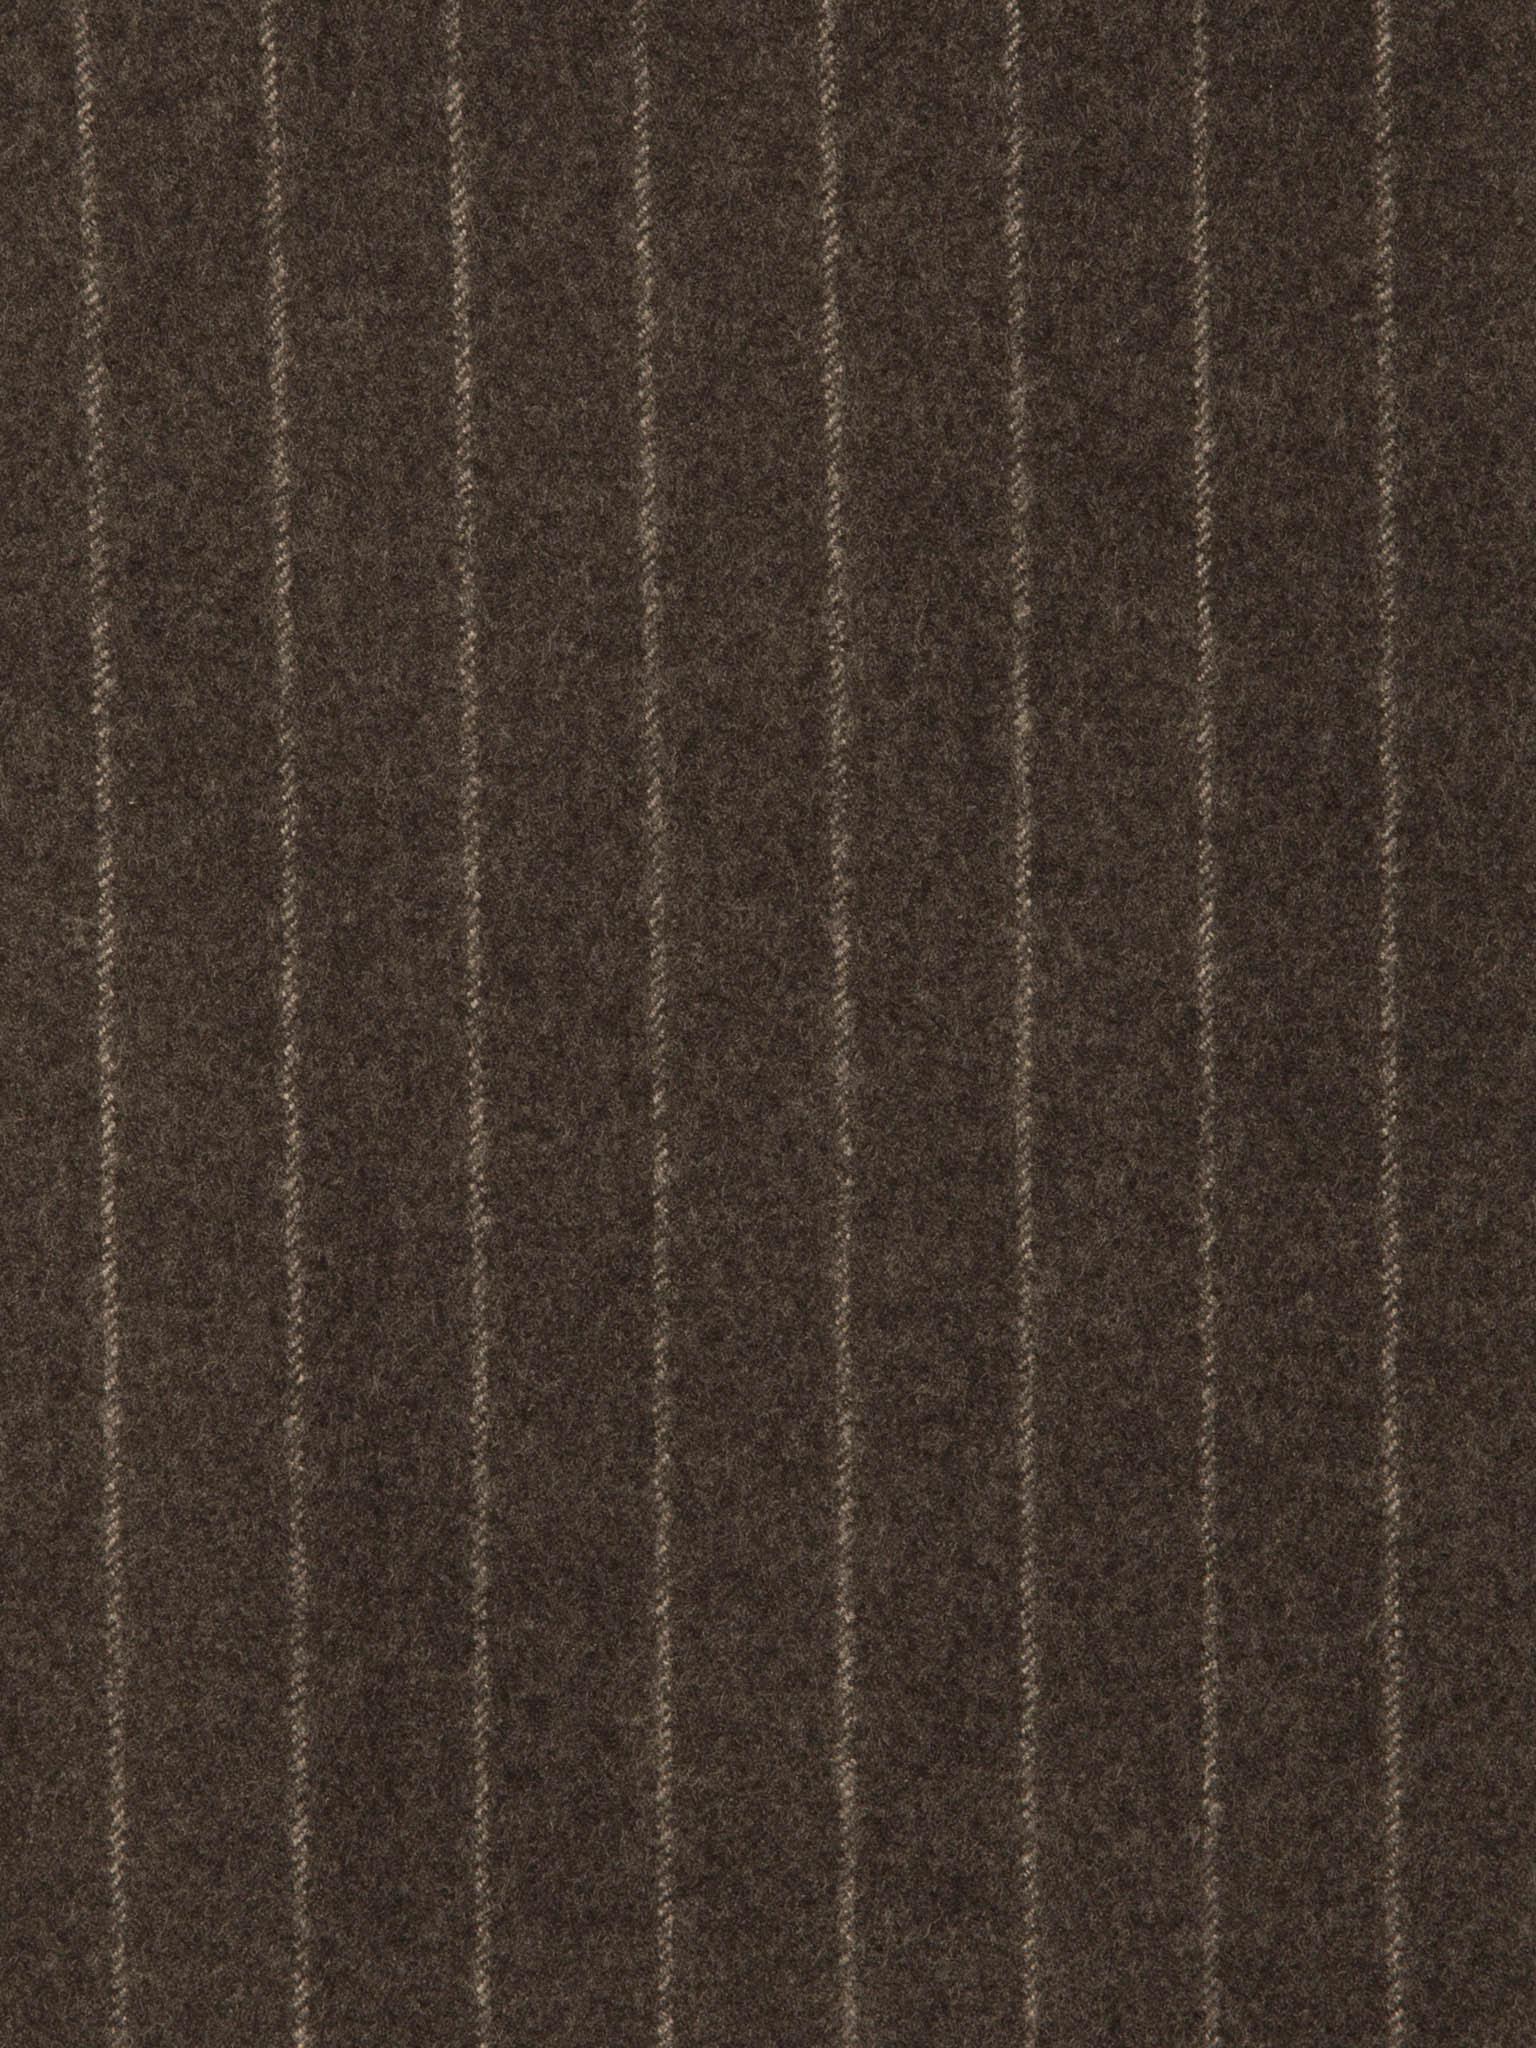 SAVILE ROW CHALK STRIPE DE12069